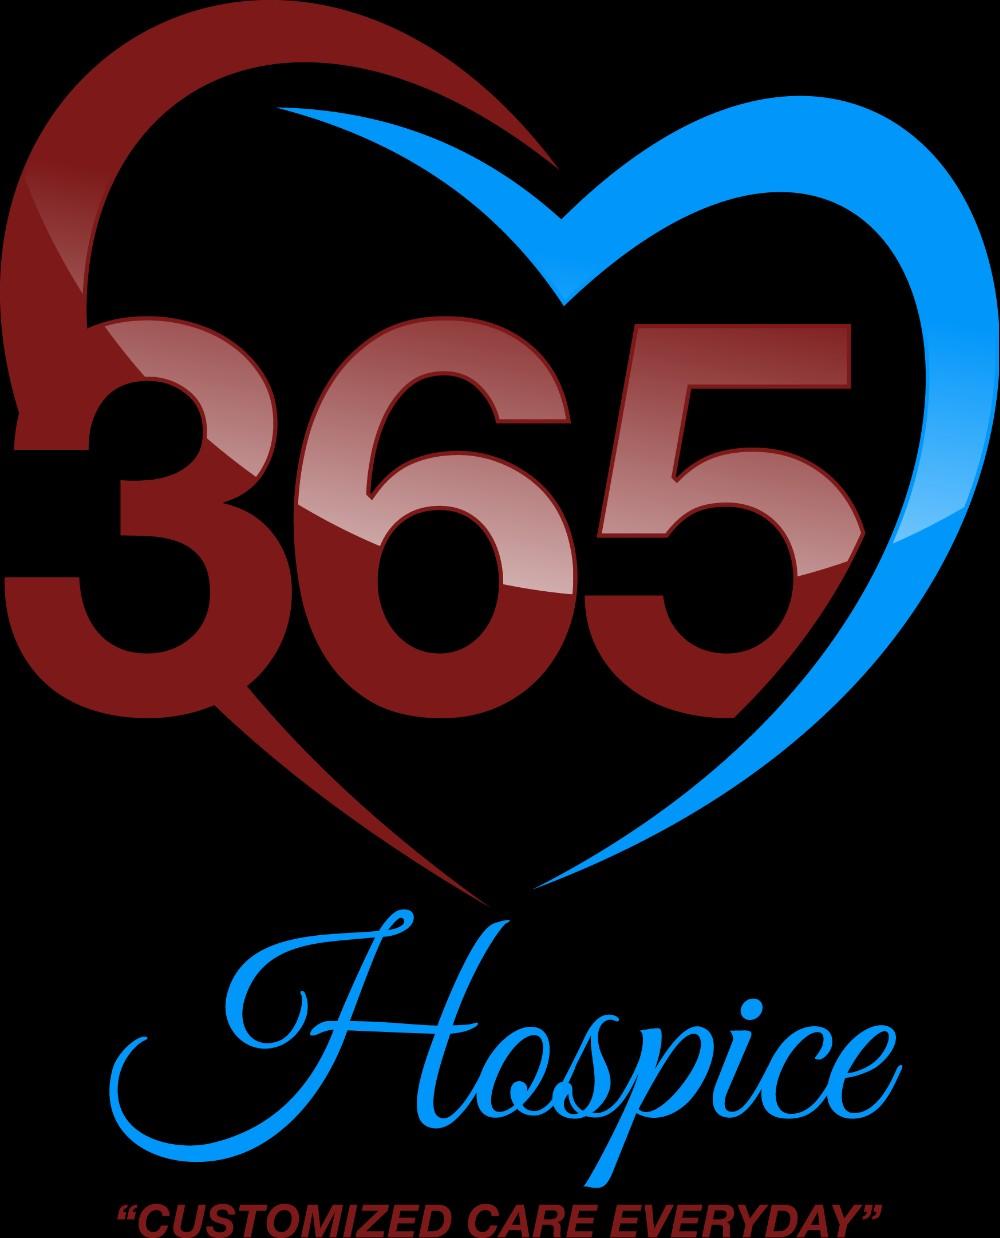 rn jobs now hiring in altoona pa ziprecruiter 365 hospice llc logo